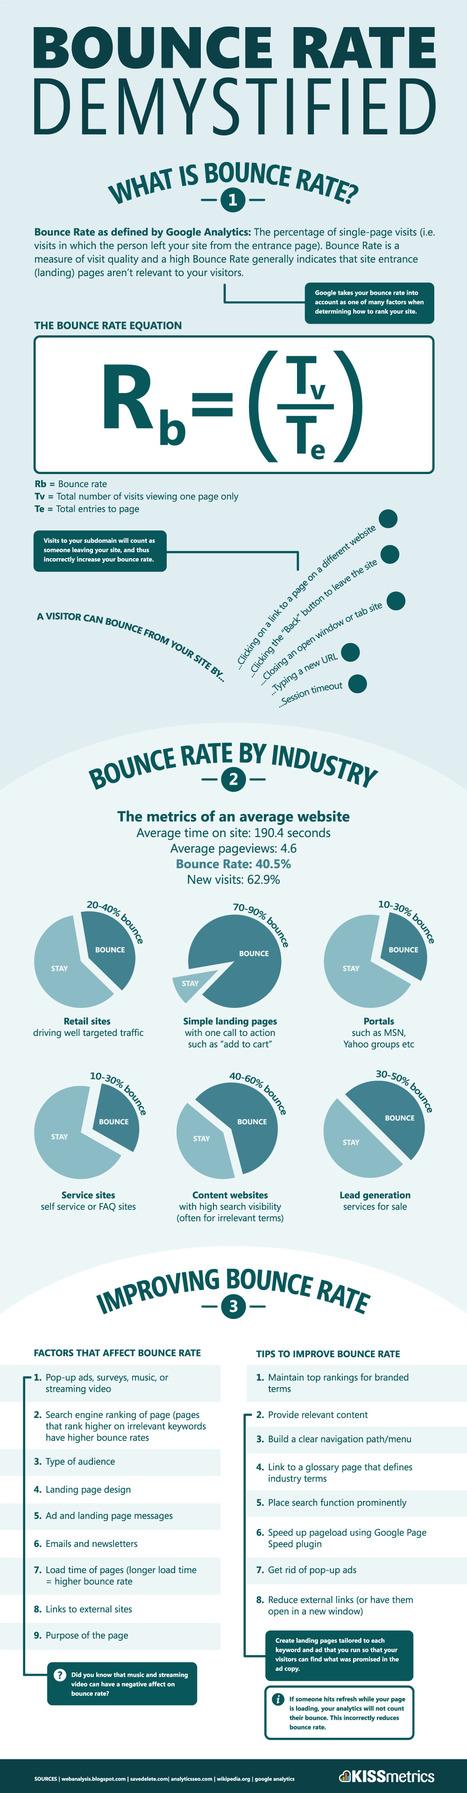 Bounce Rate Demystified, Kissmetrics | Marketing, PR & Communications | Scoop.it